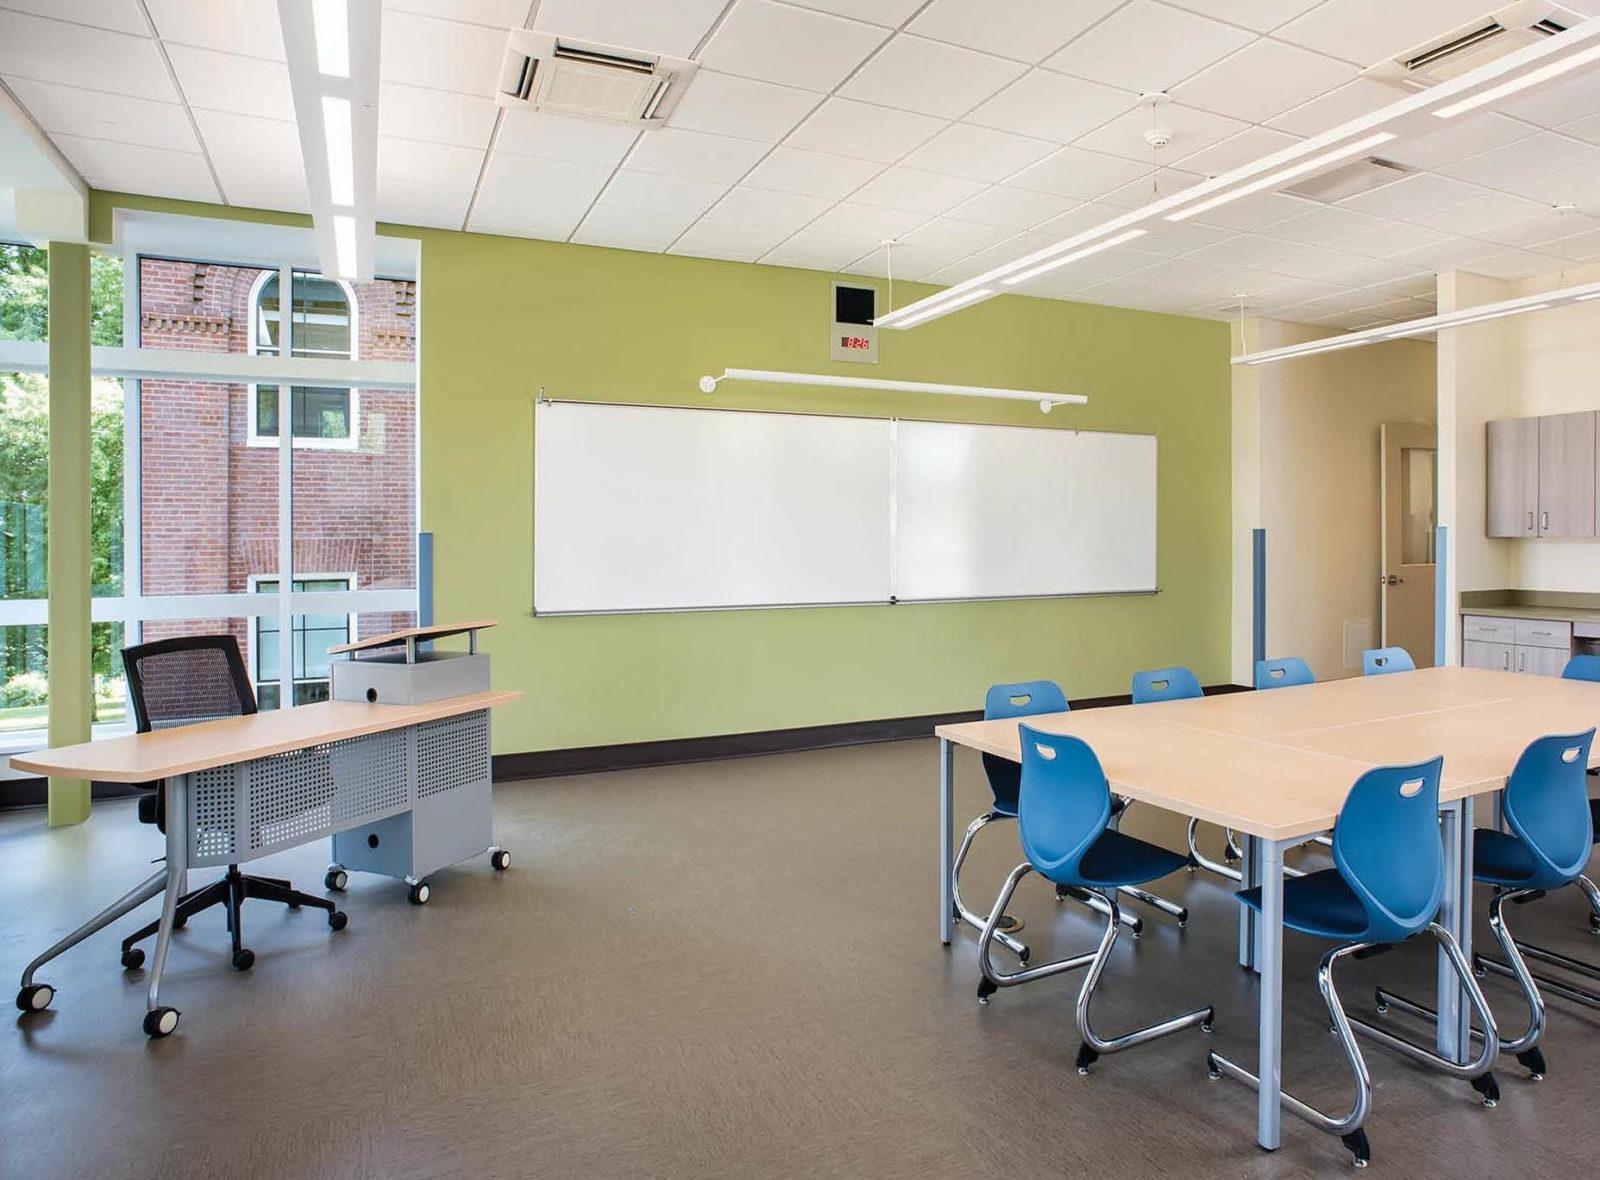 portland maine high school education classroom space k-12 furniture